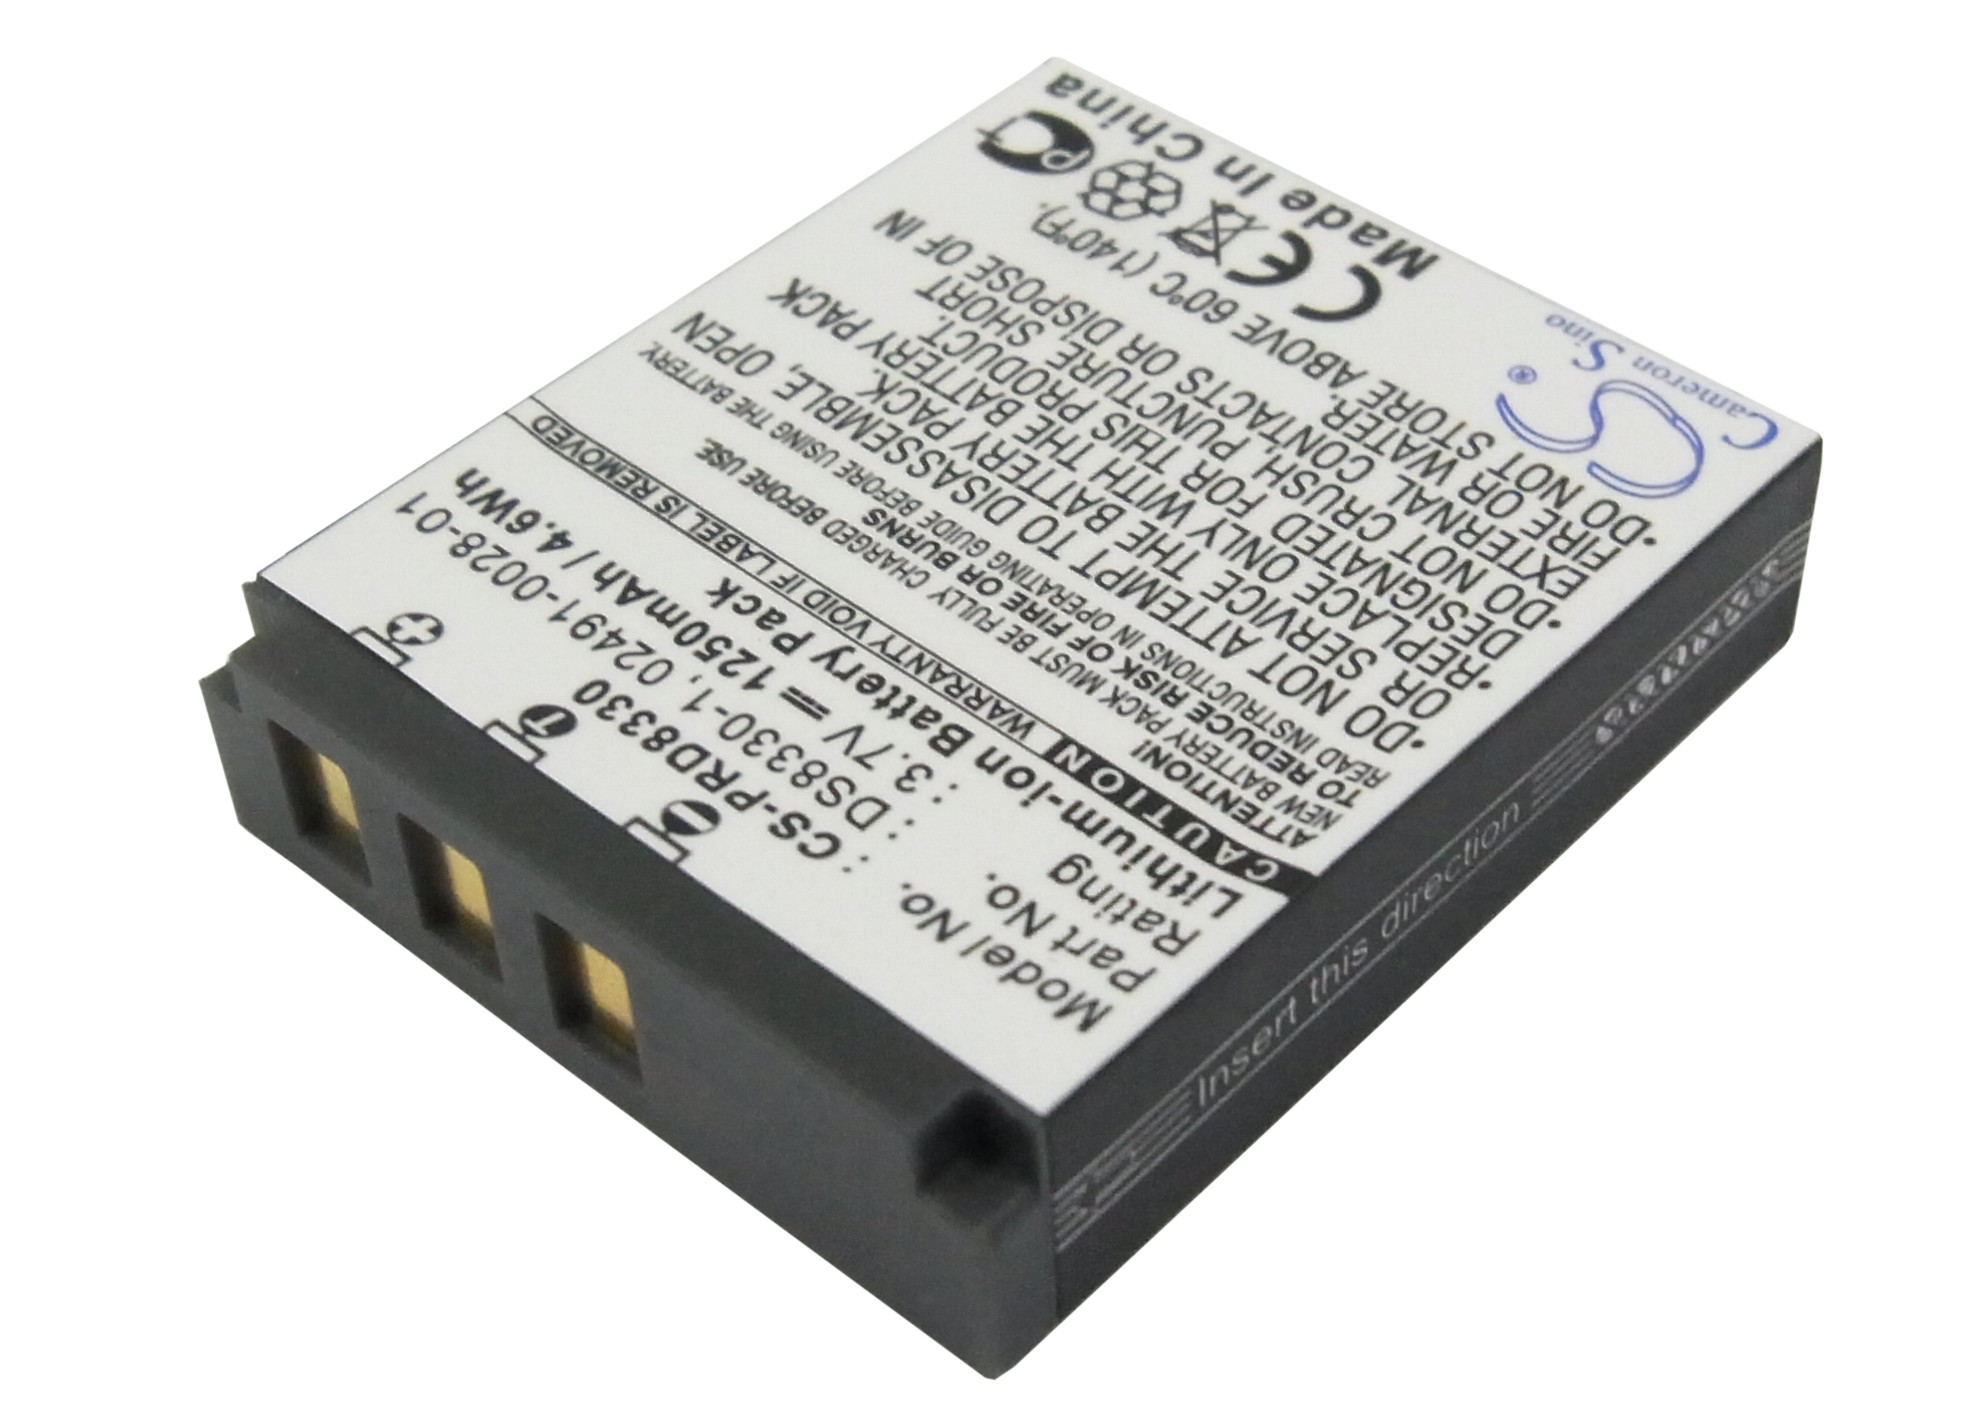 Bateria para Revue dc80sz dc-80sz 80sz batería